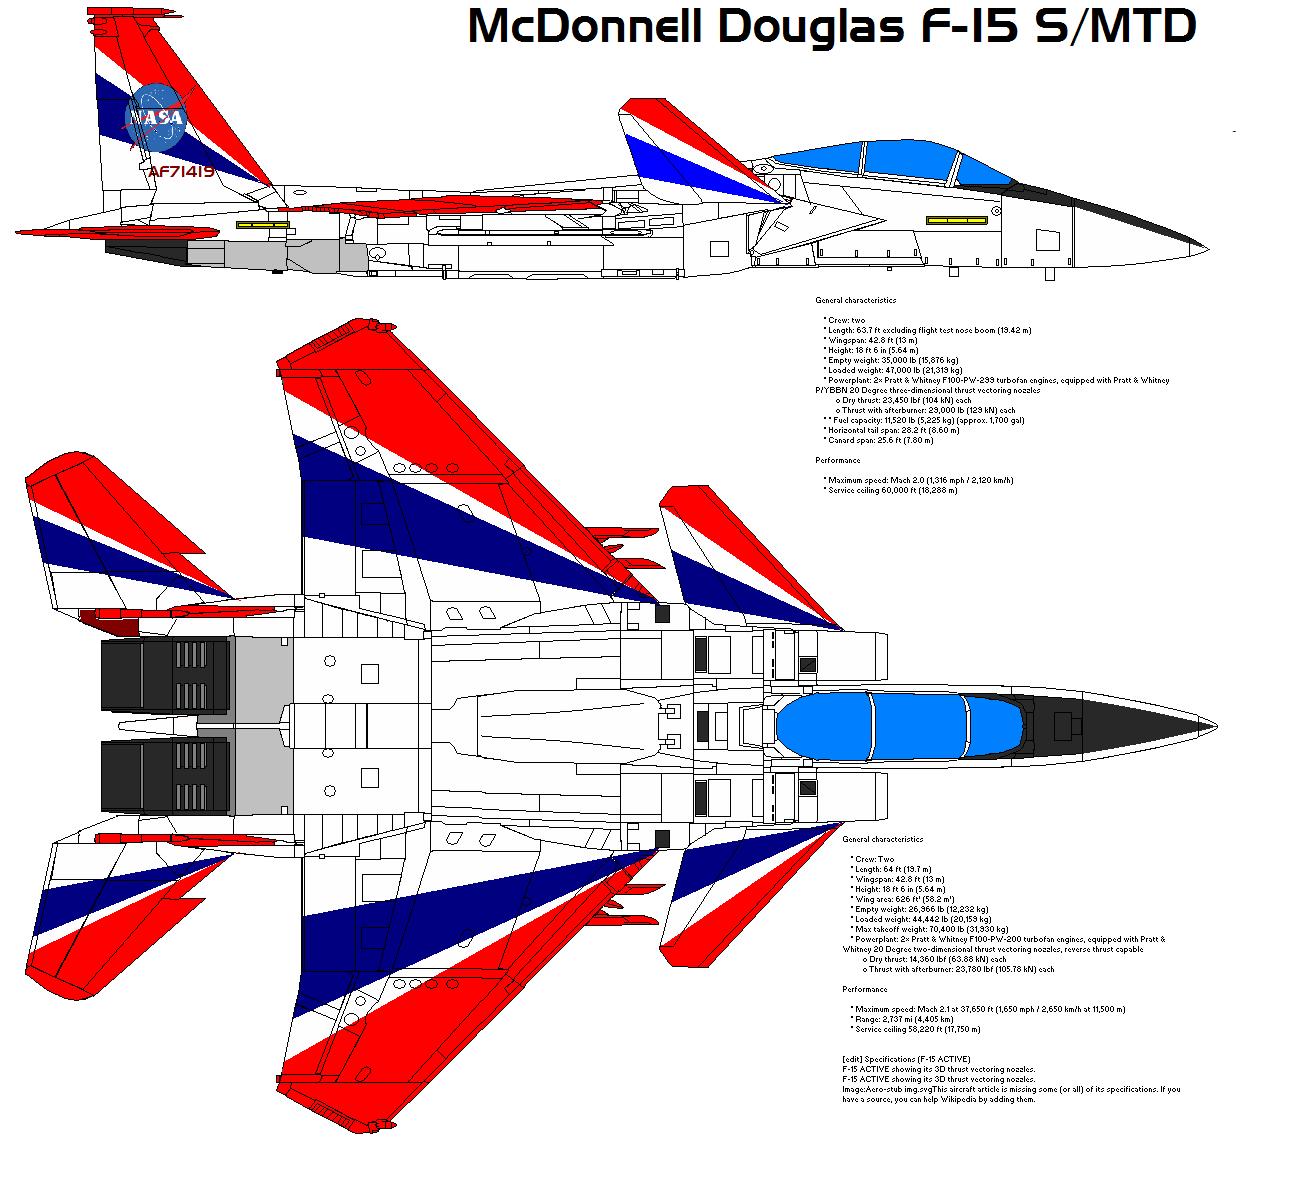 McDonnell Douglas F-15 S-MTD By Bagera3005 On DeviantArt